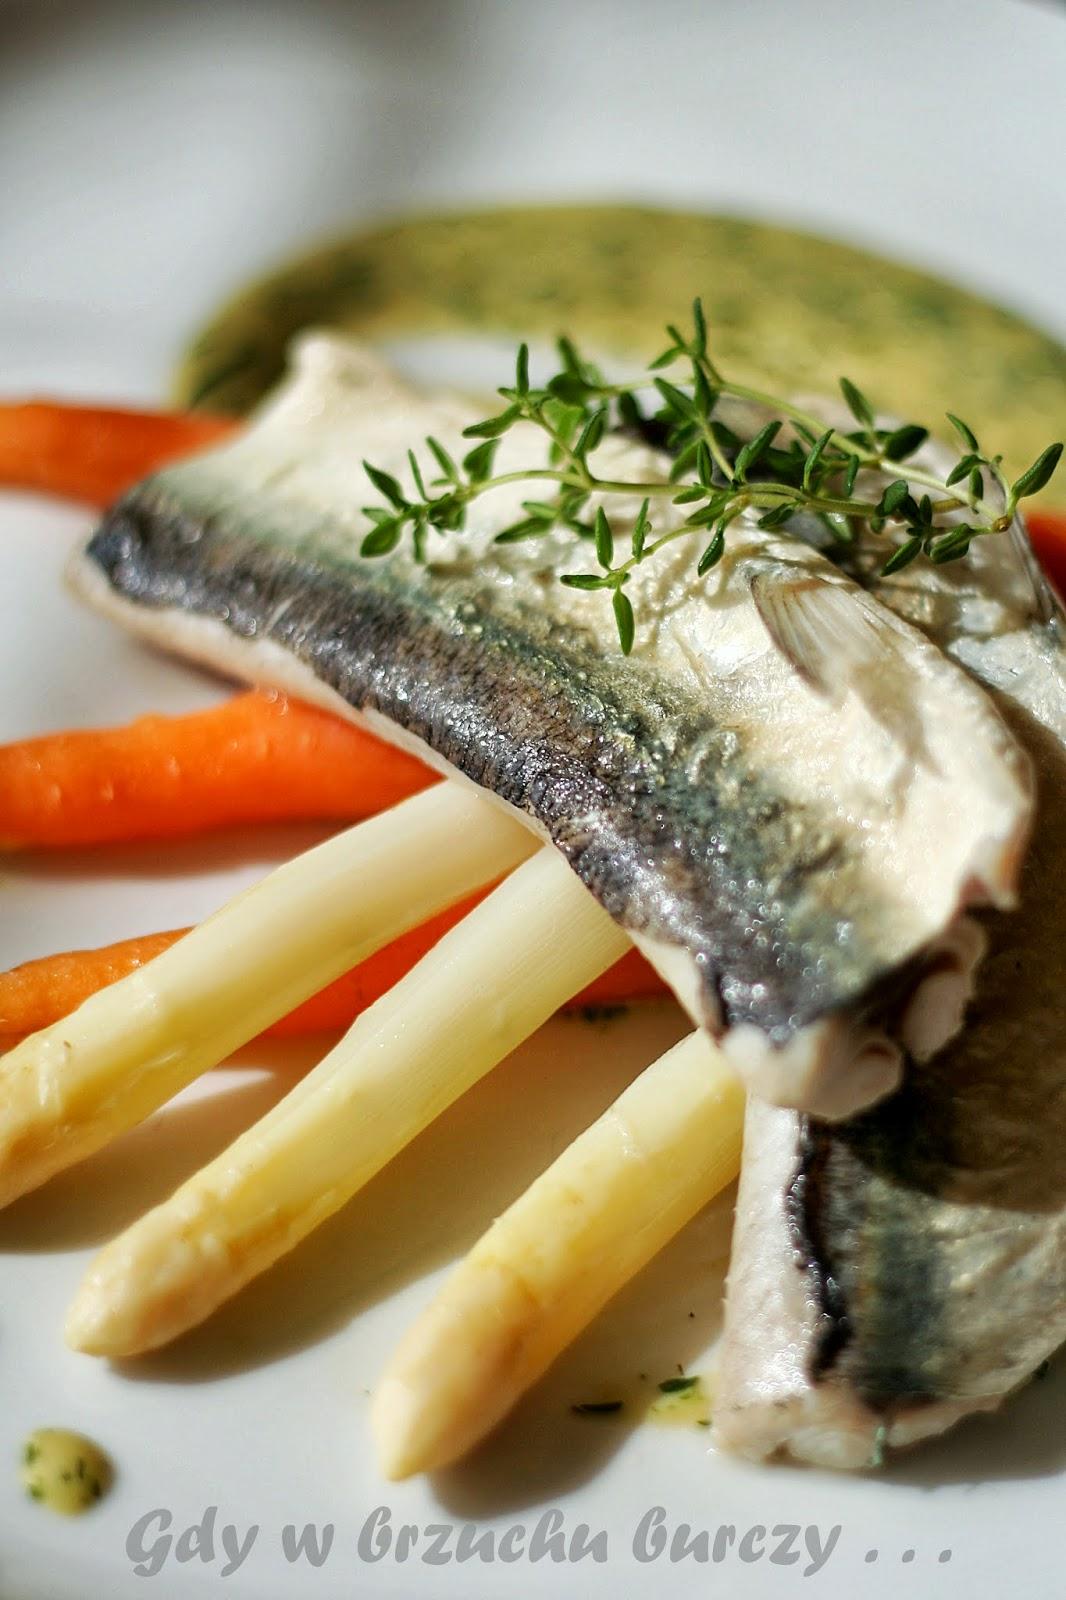 Gotowana ryba